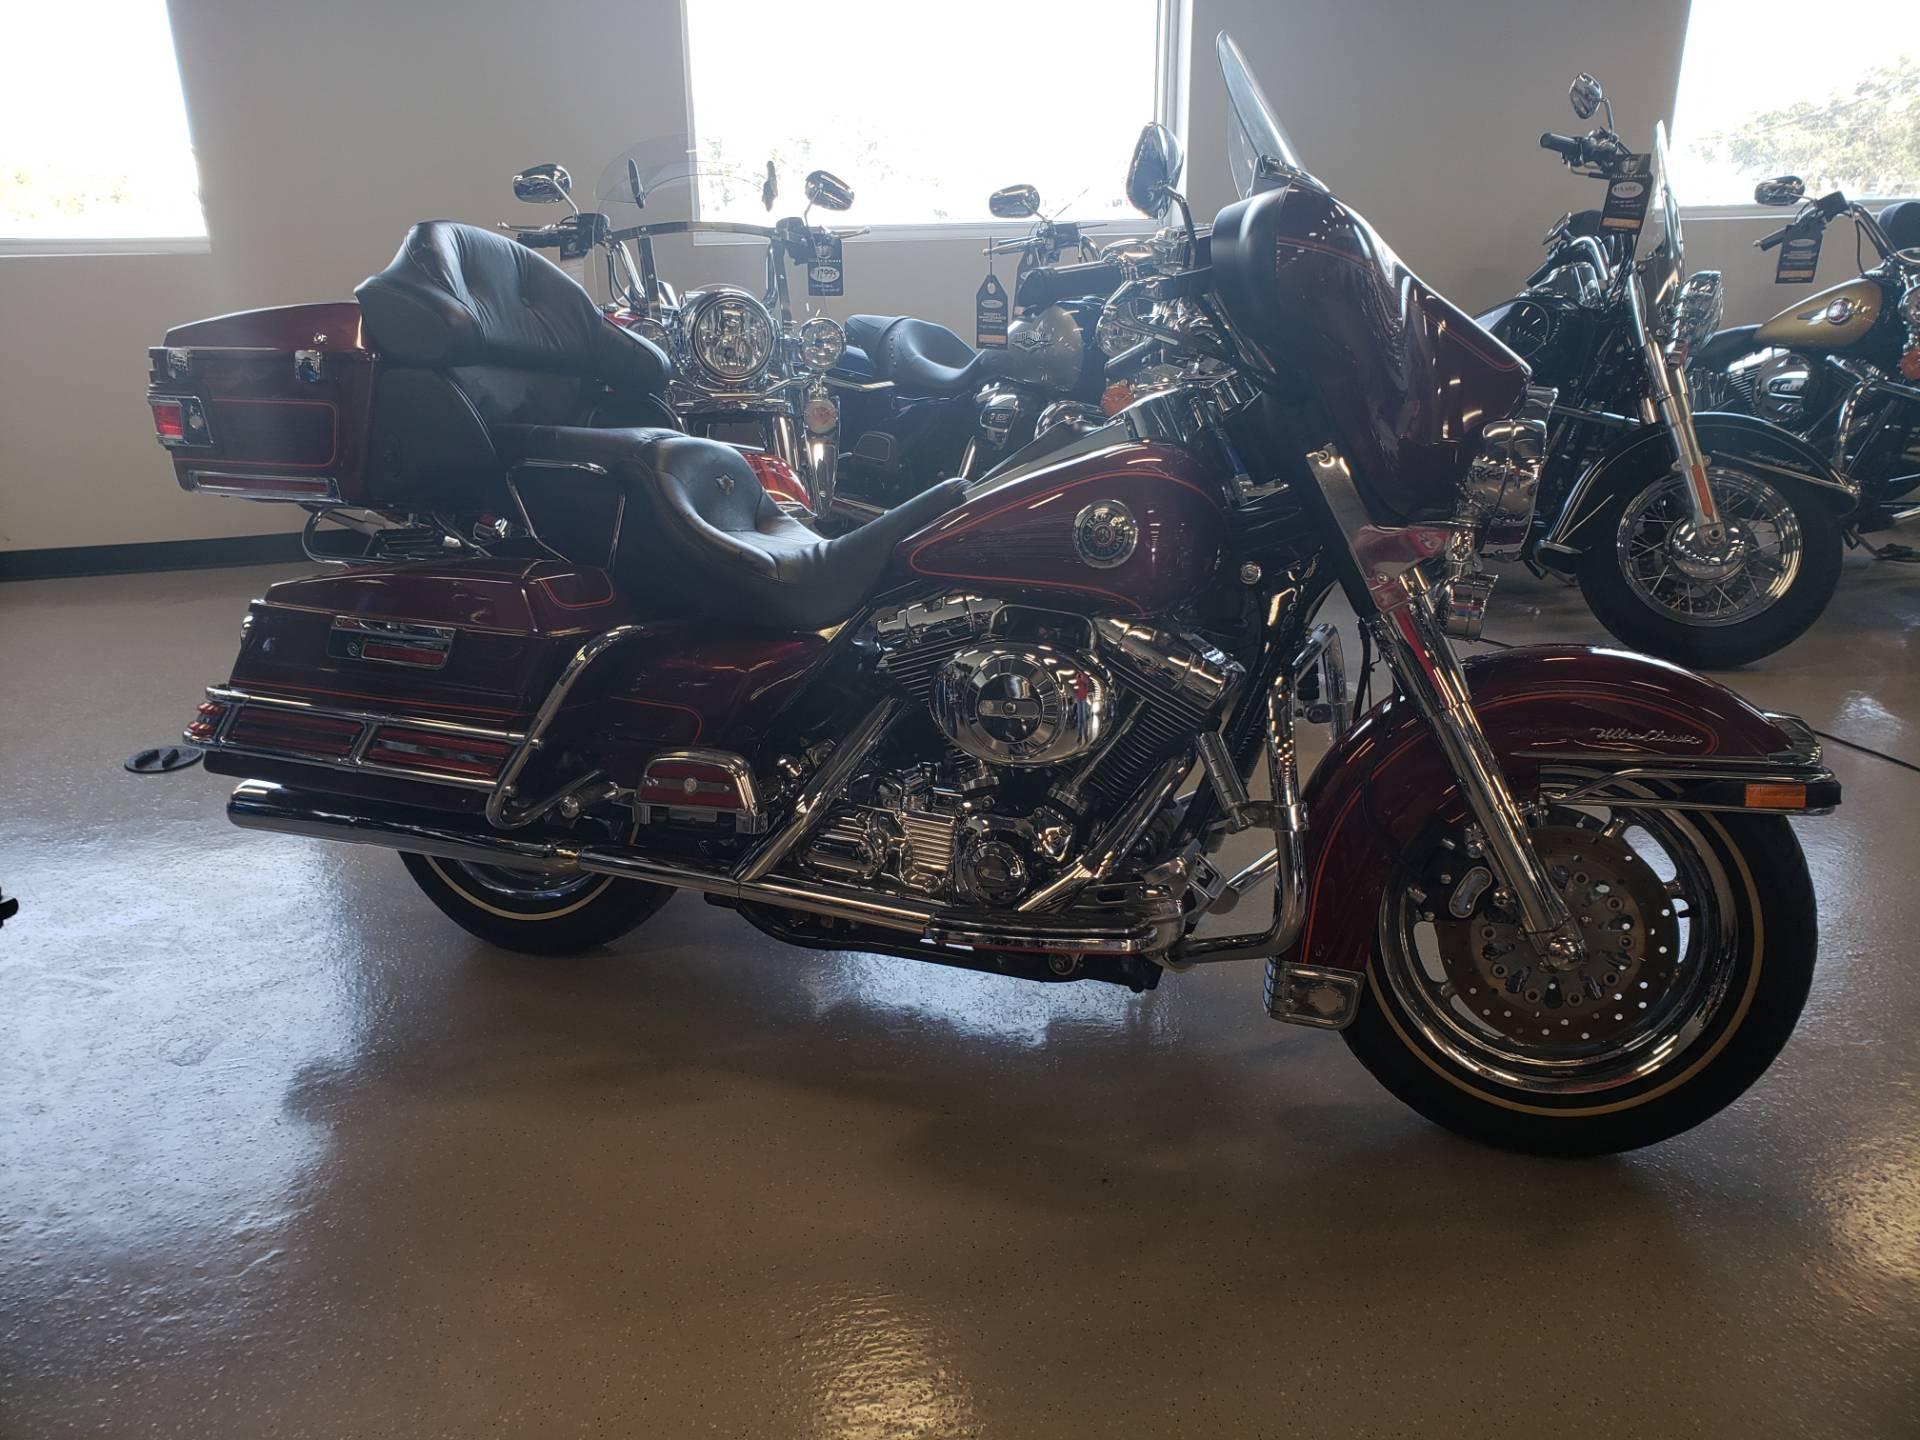 Used 2001 Harley Davidson Flhtcui Ultra Classic Electra Glide